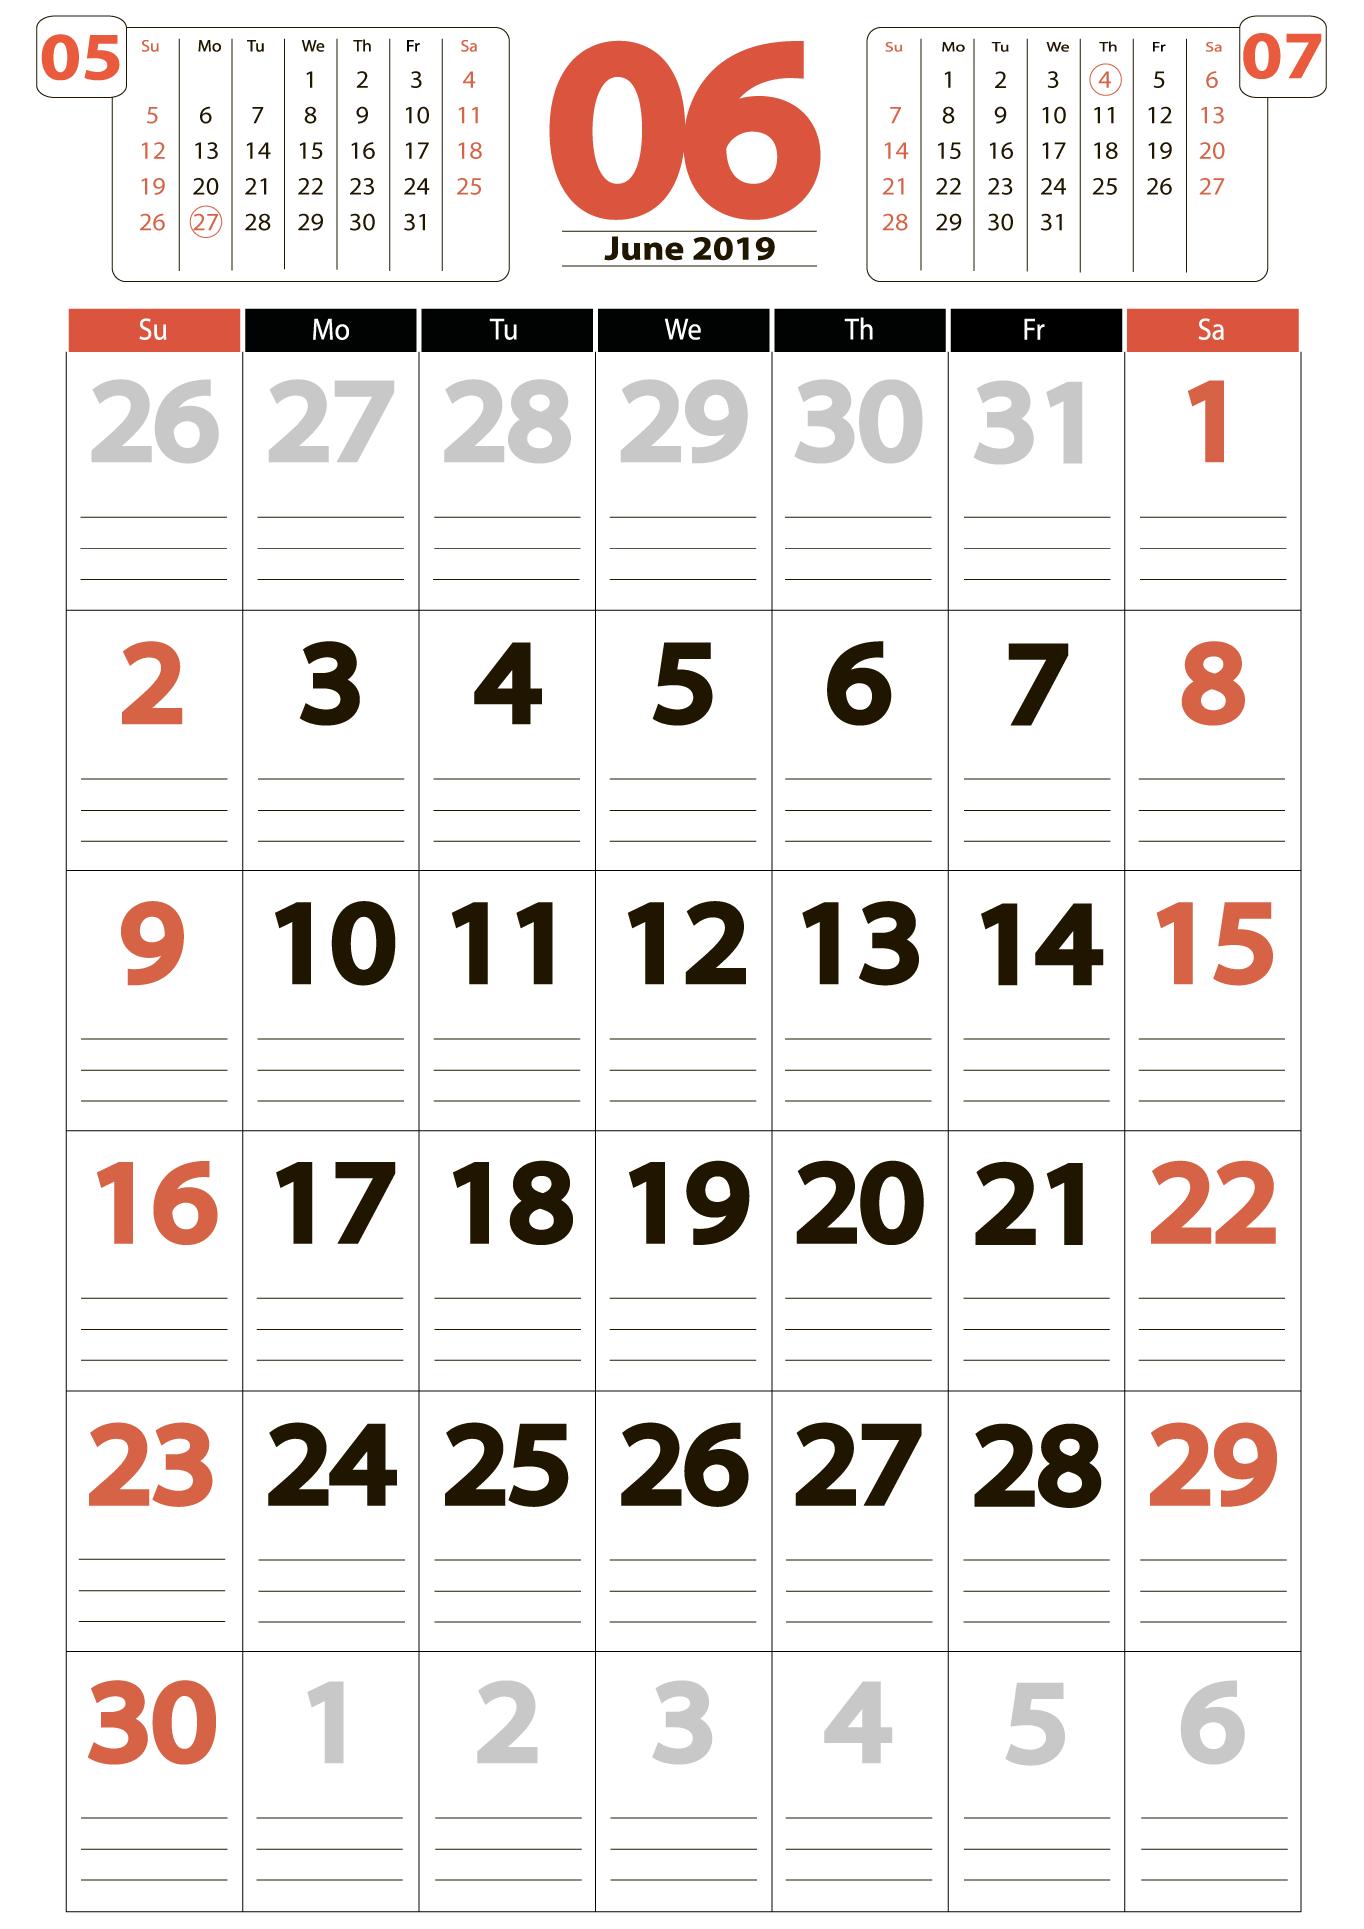 Download calendar 06 2019